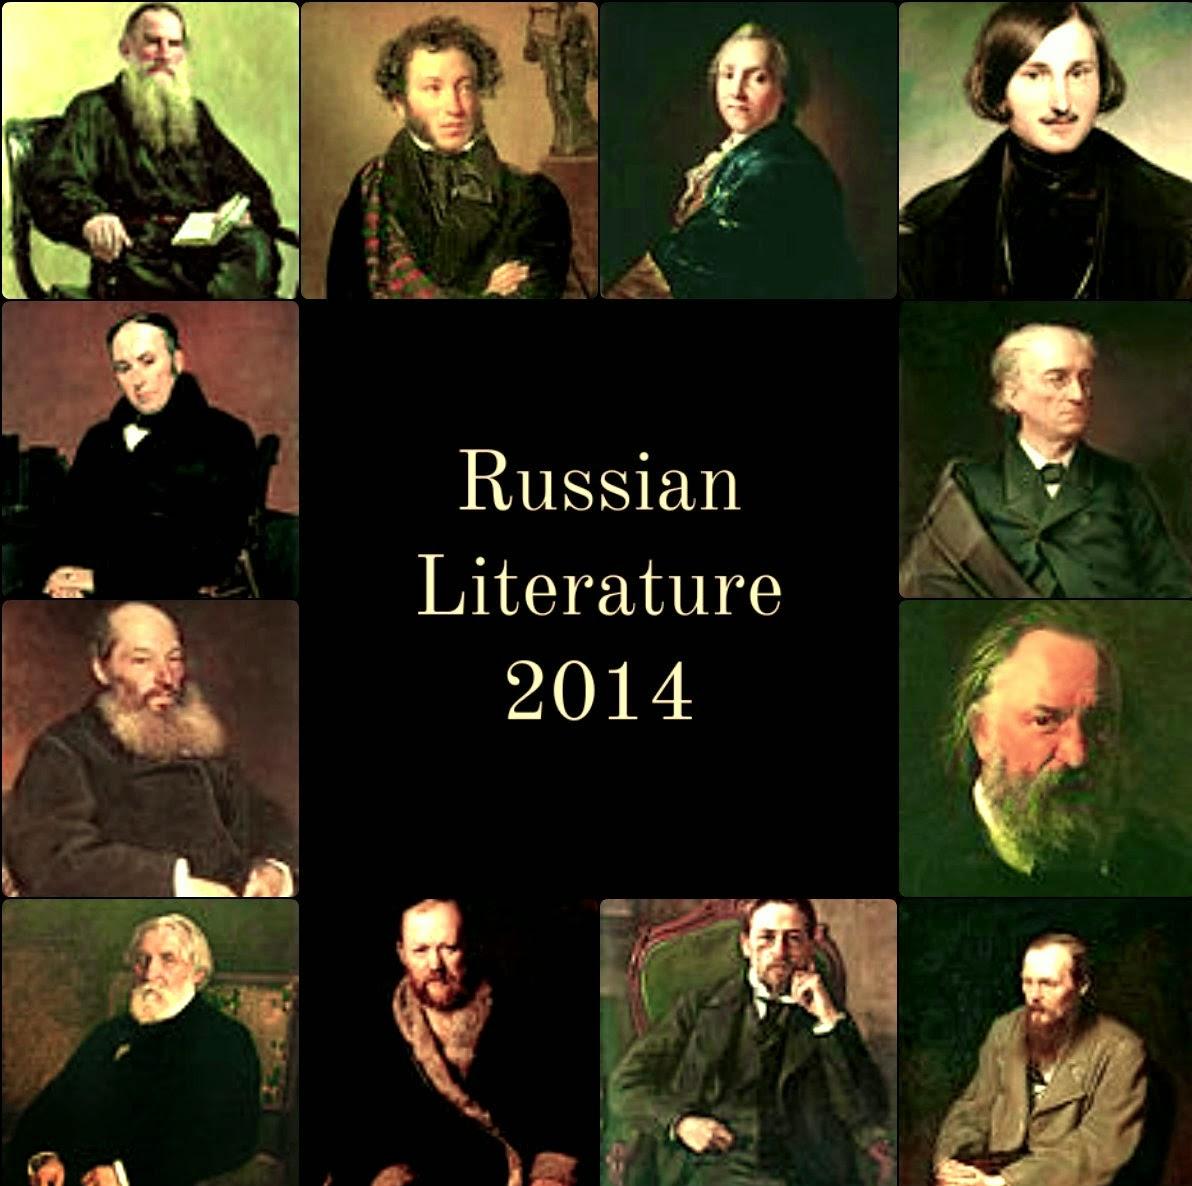 Russian Literature 2014